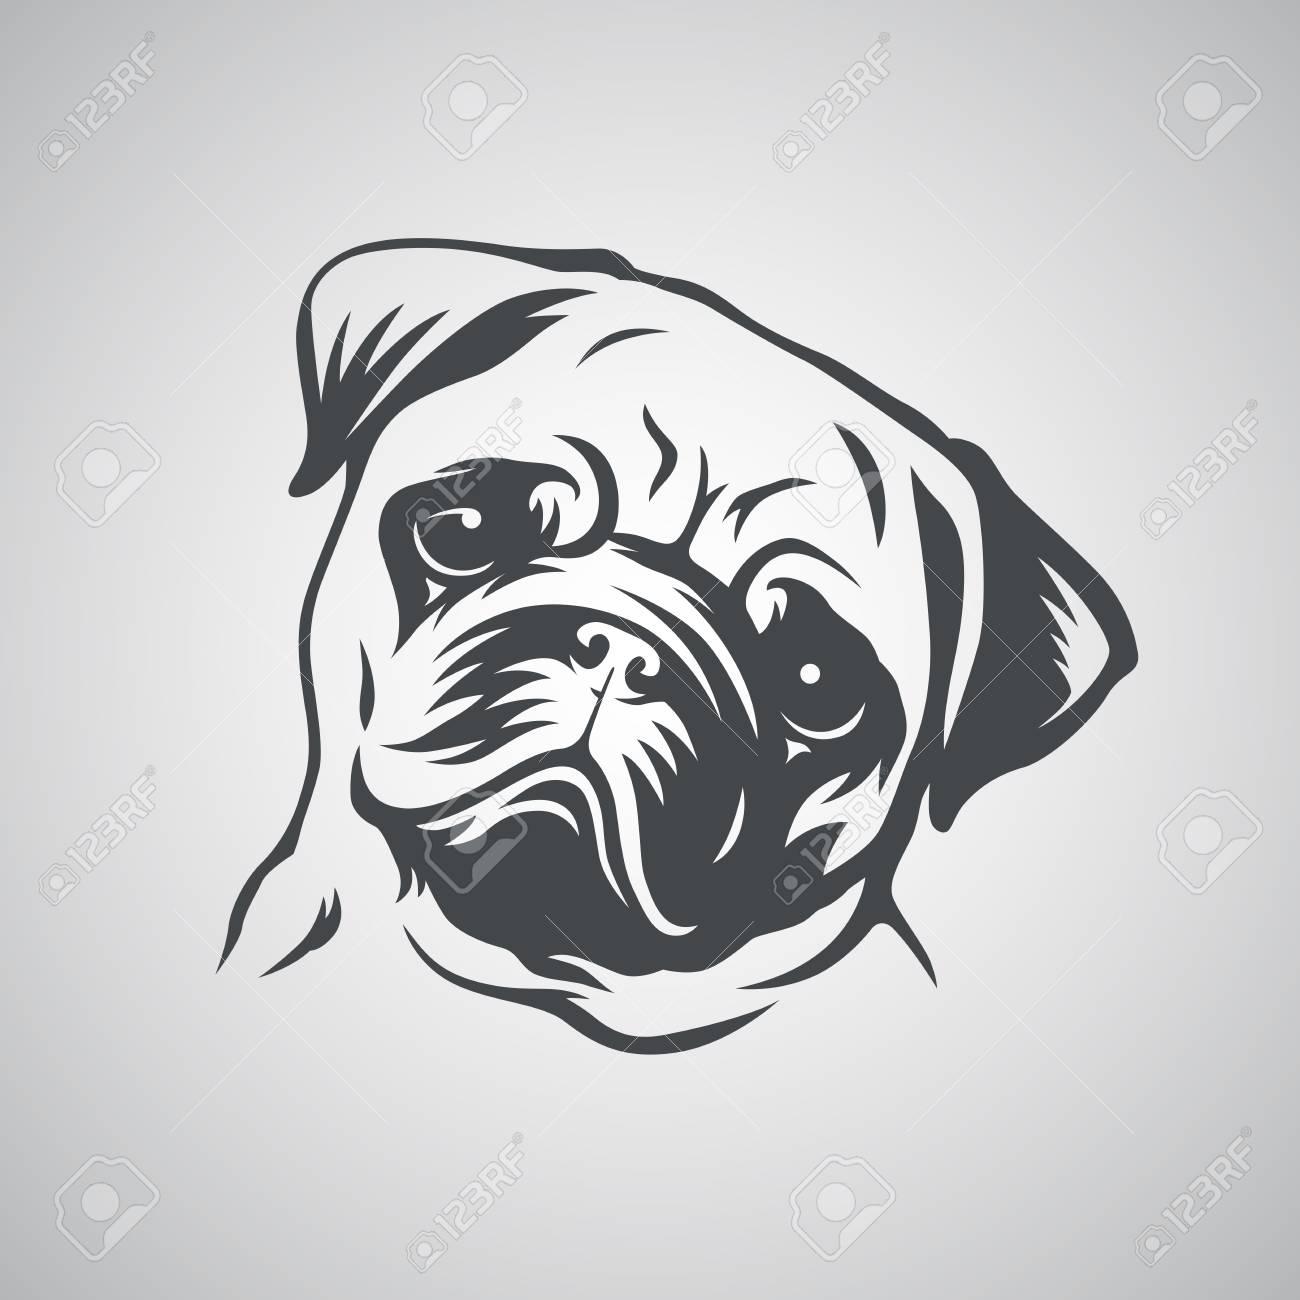 cute pug dog head vector illustration royalty free cliparts vectors and stock illustration image 98116221 123rf com